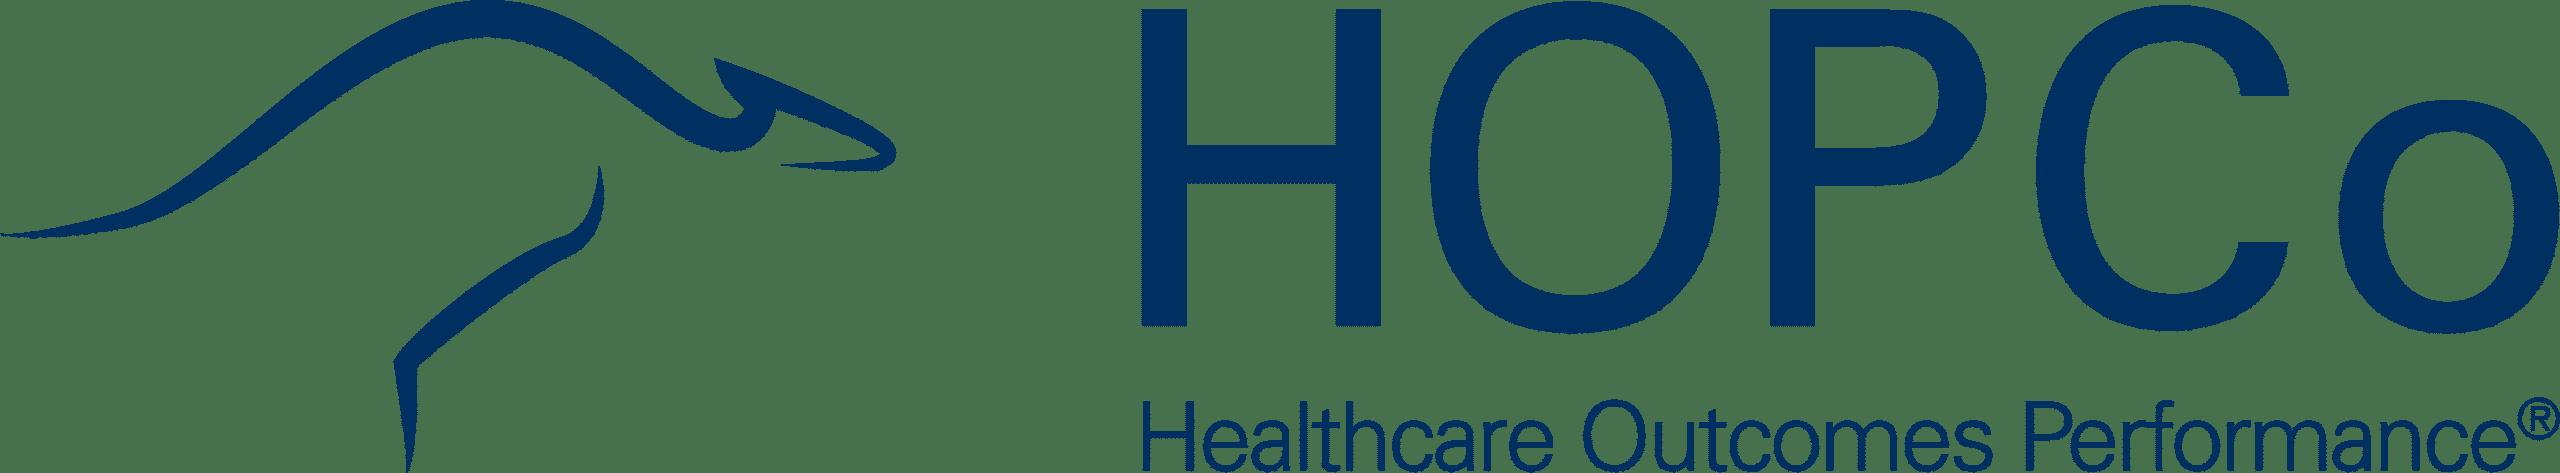 Healthcare Outcomes Performance Company